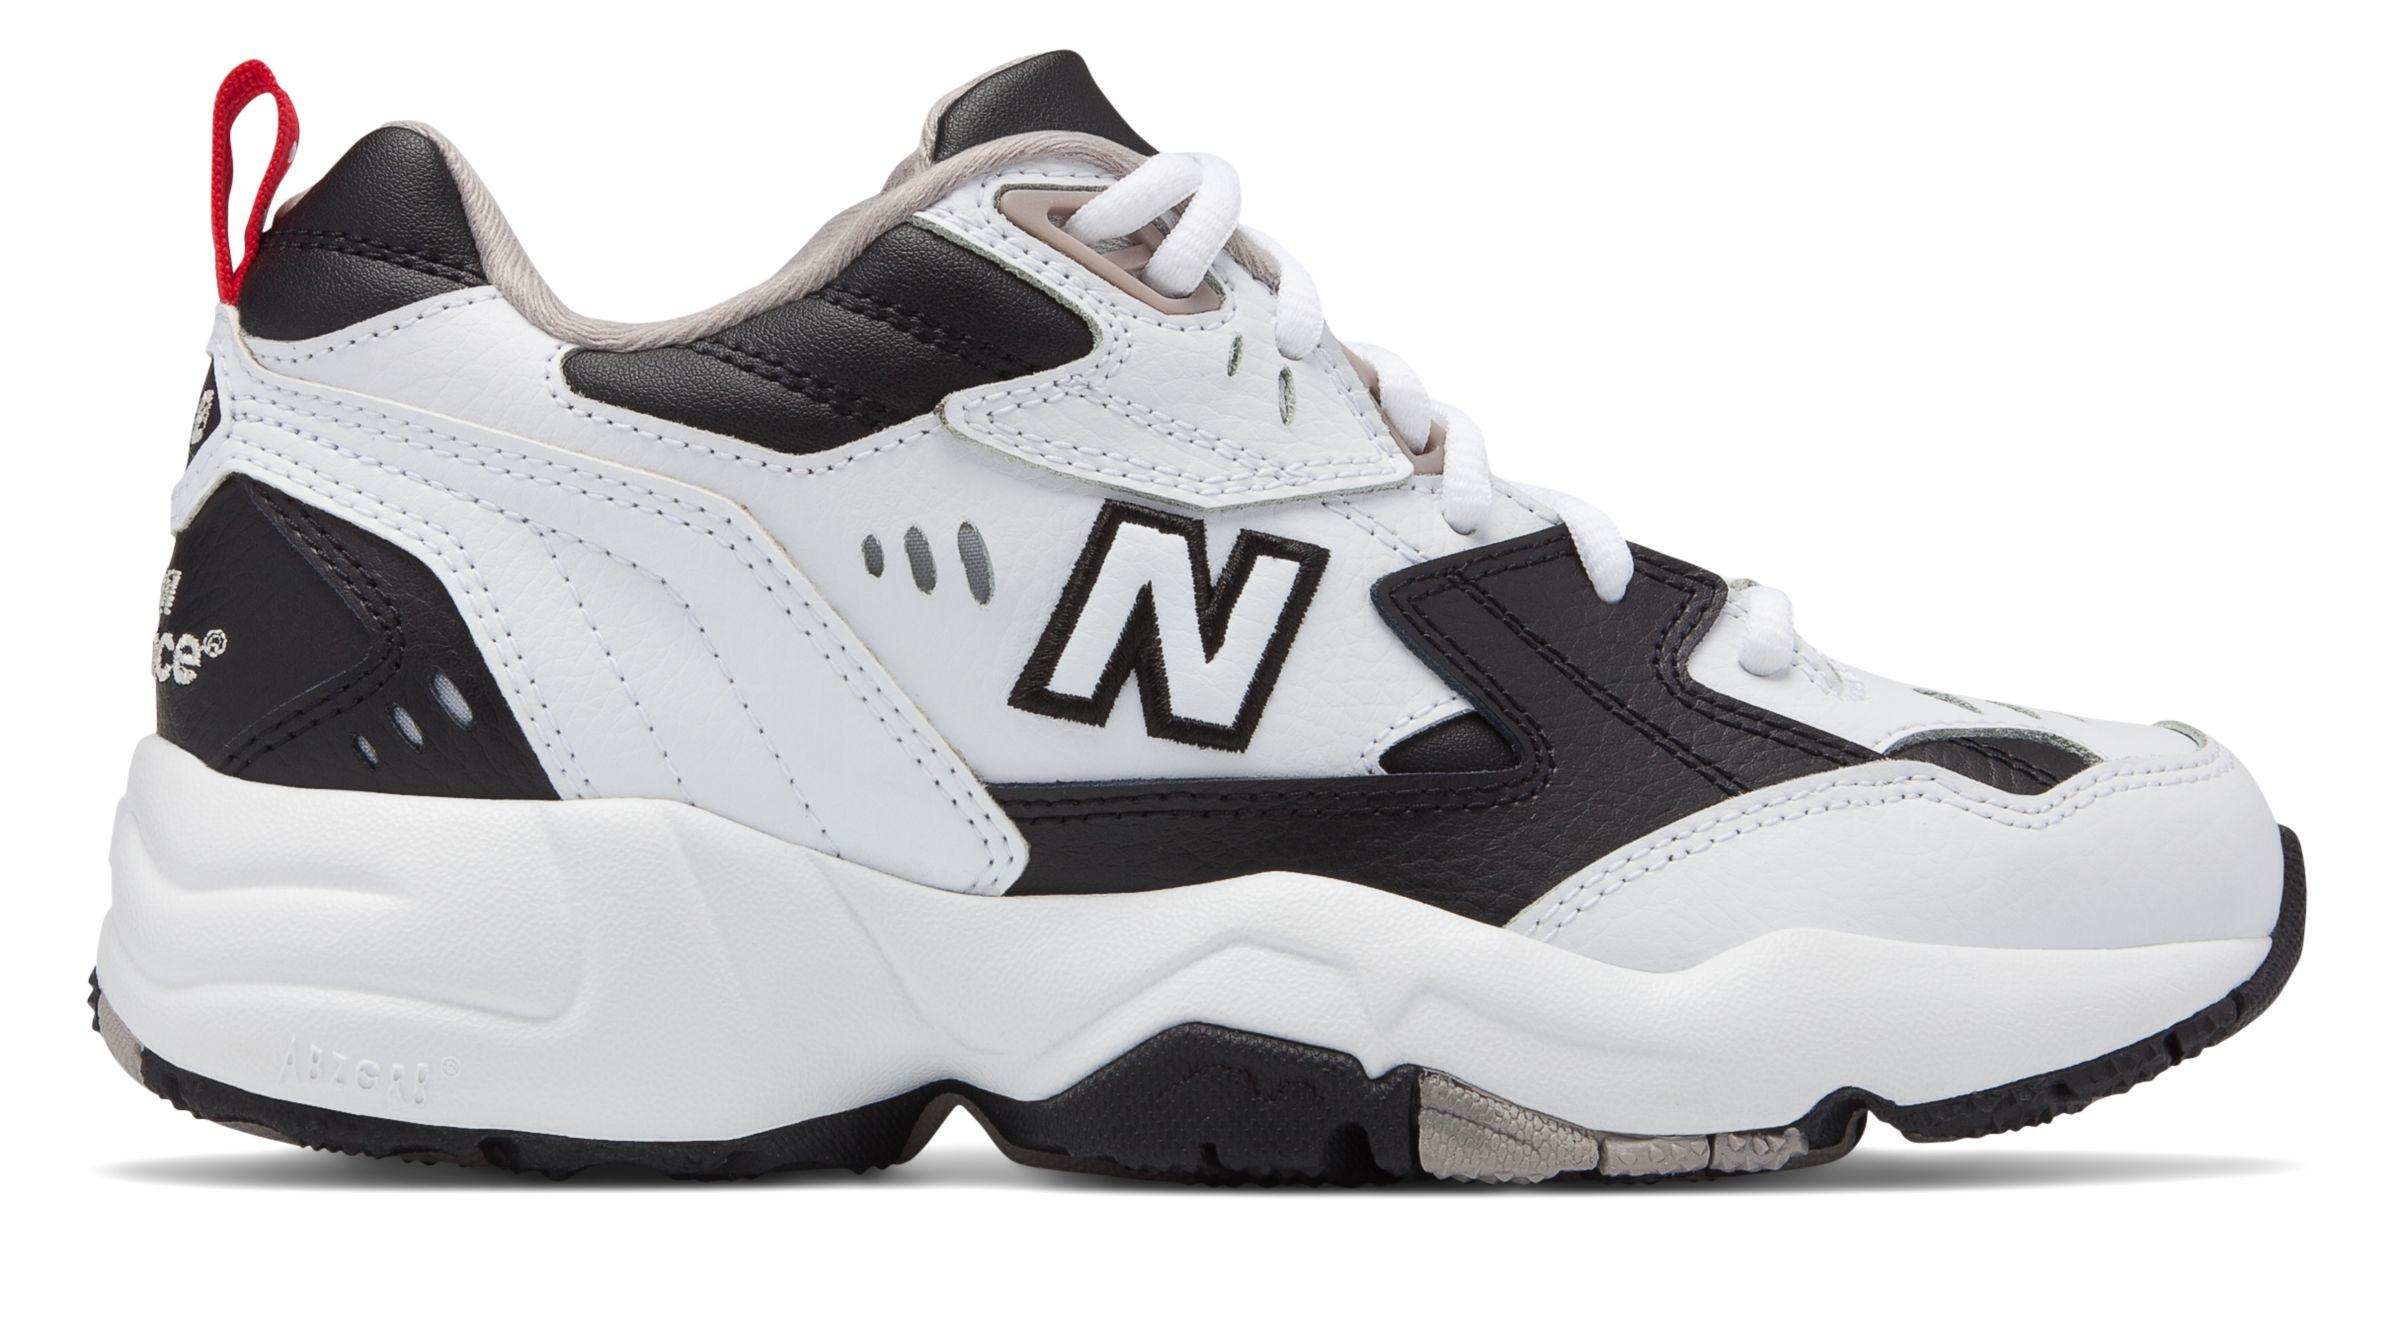 Women's 608v1 Training Shoes- New Balance